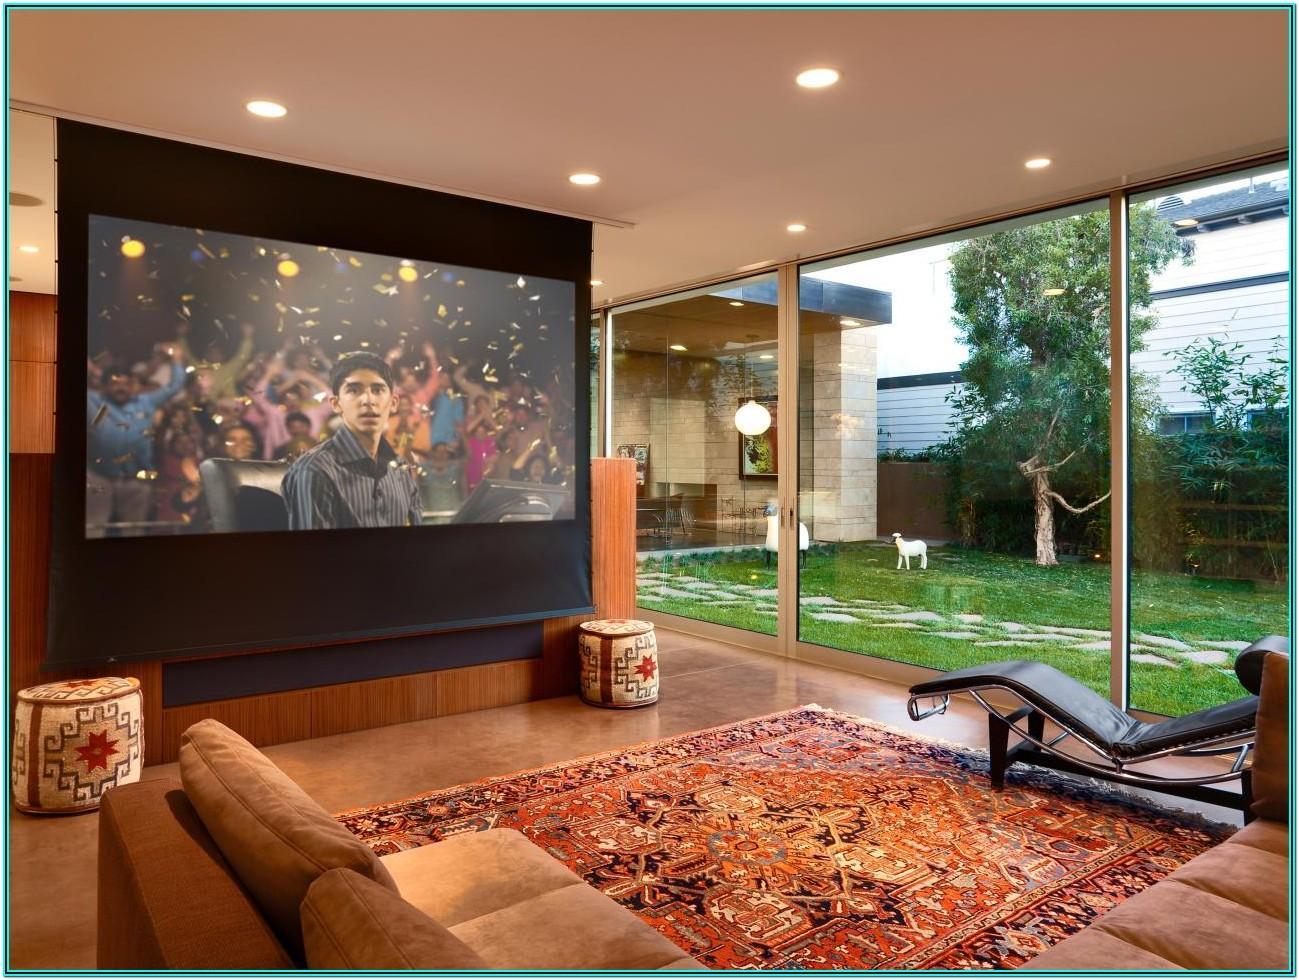 Living Room Projector Mount Ideas